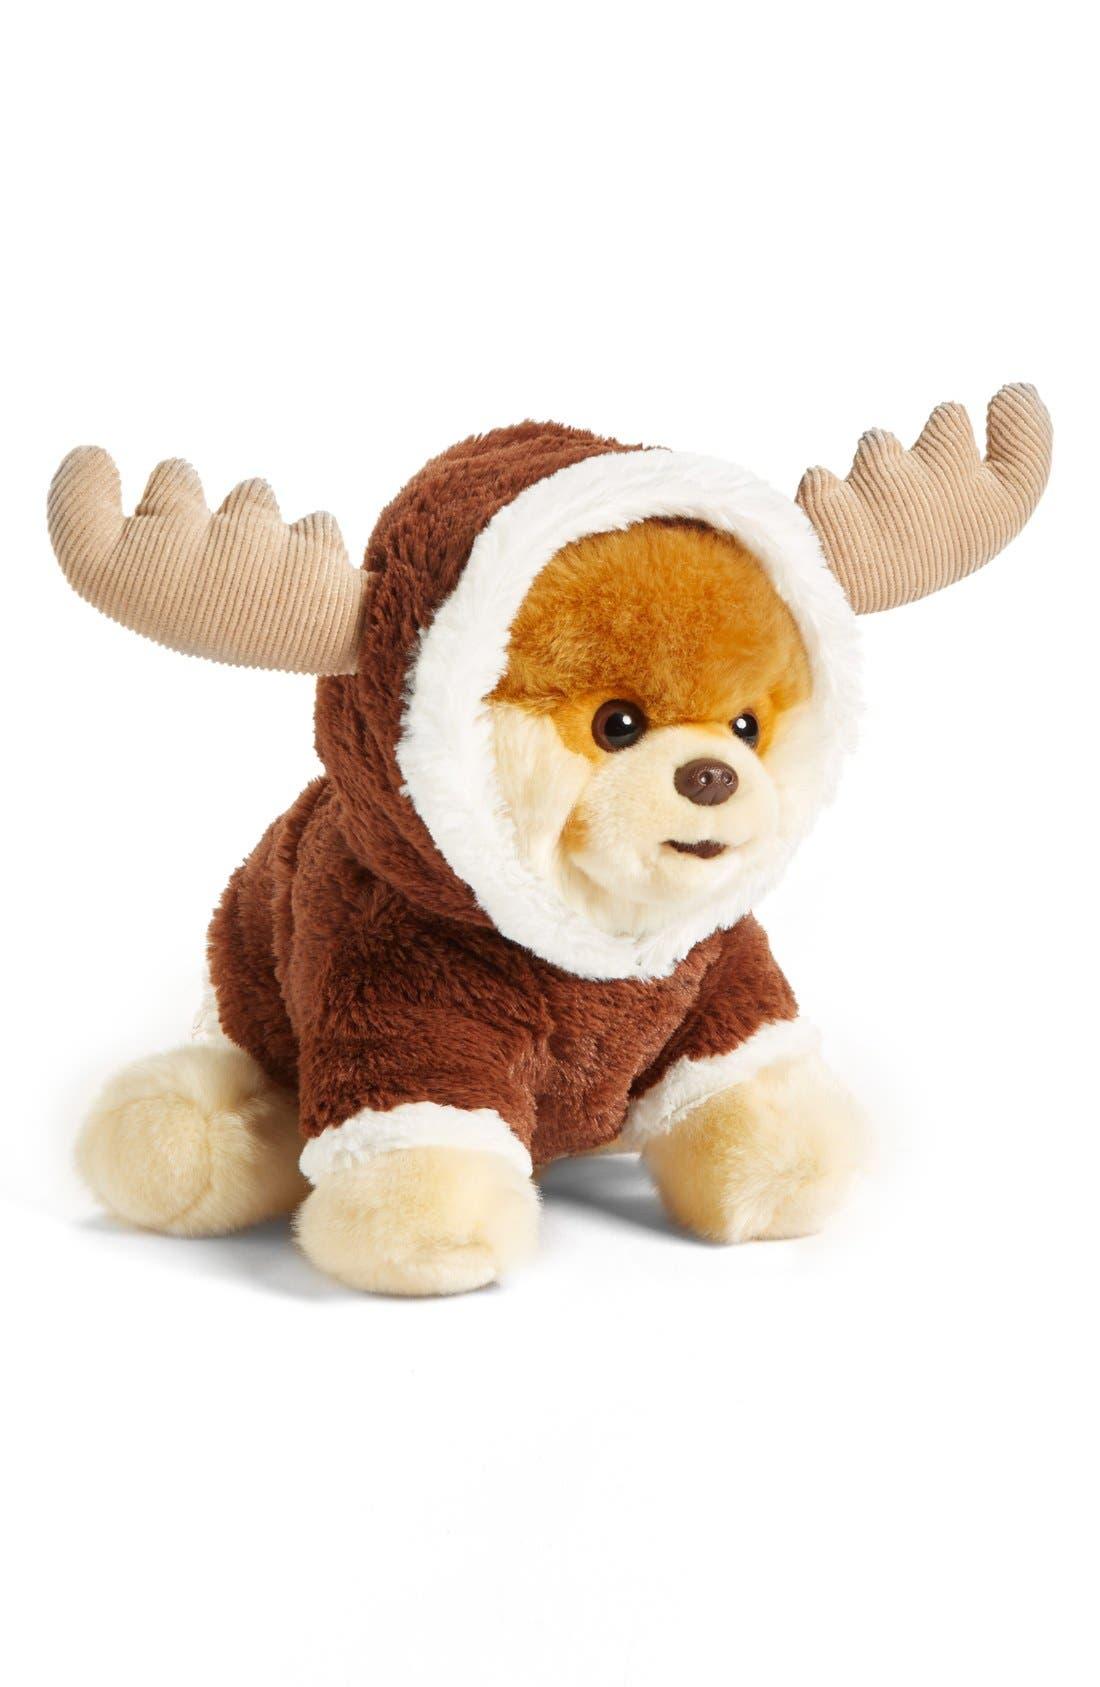 Main Image - Gund Boo Reindeer Stuffed Animal (Nordstrom Exclusive)